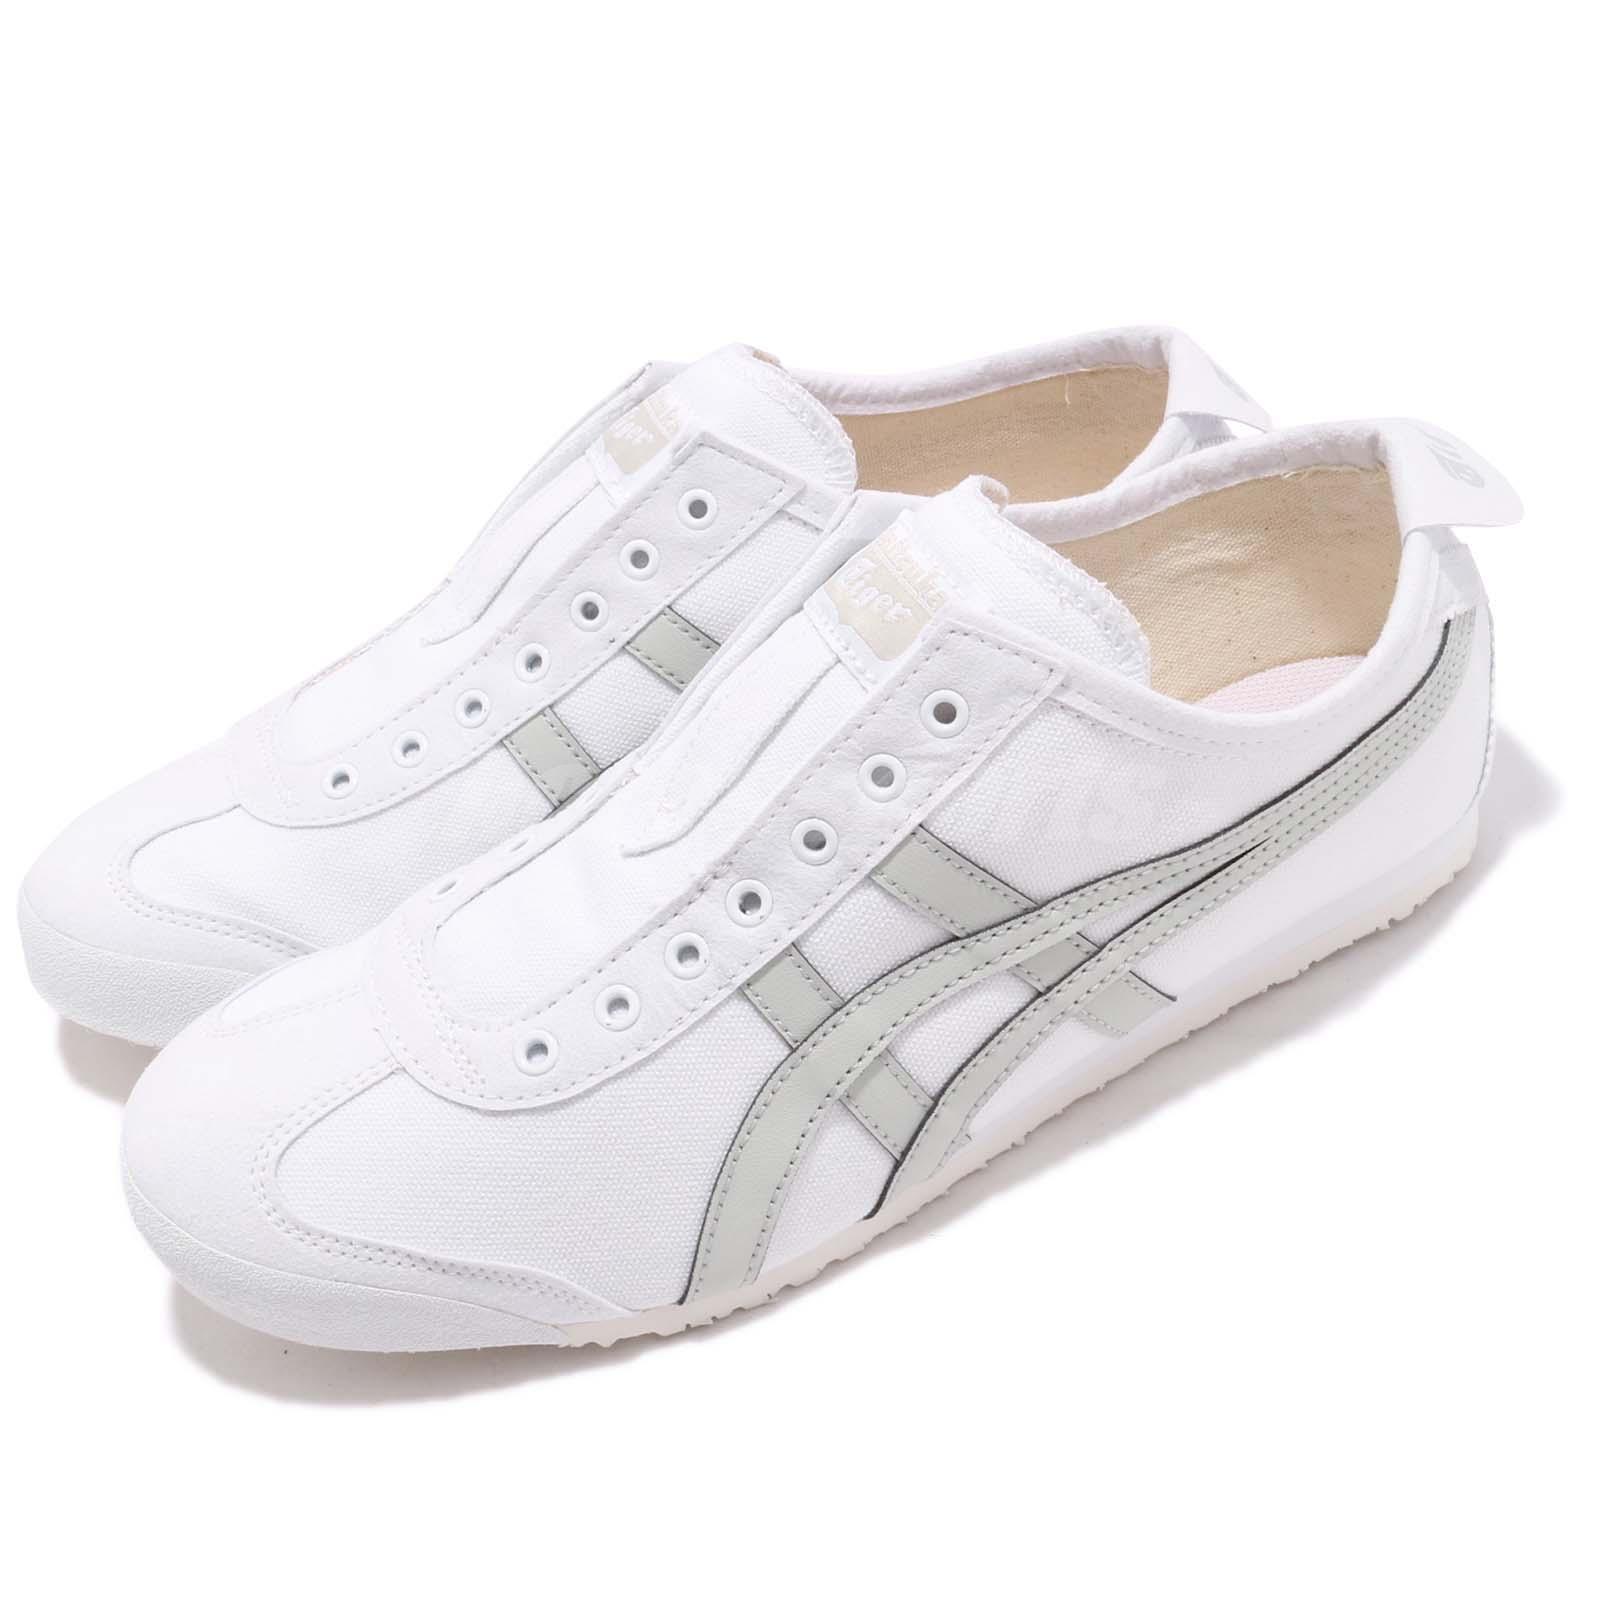 onitsuka tiger mexico 66 shoes size chart en argentina usa